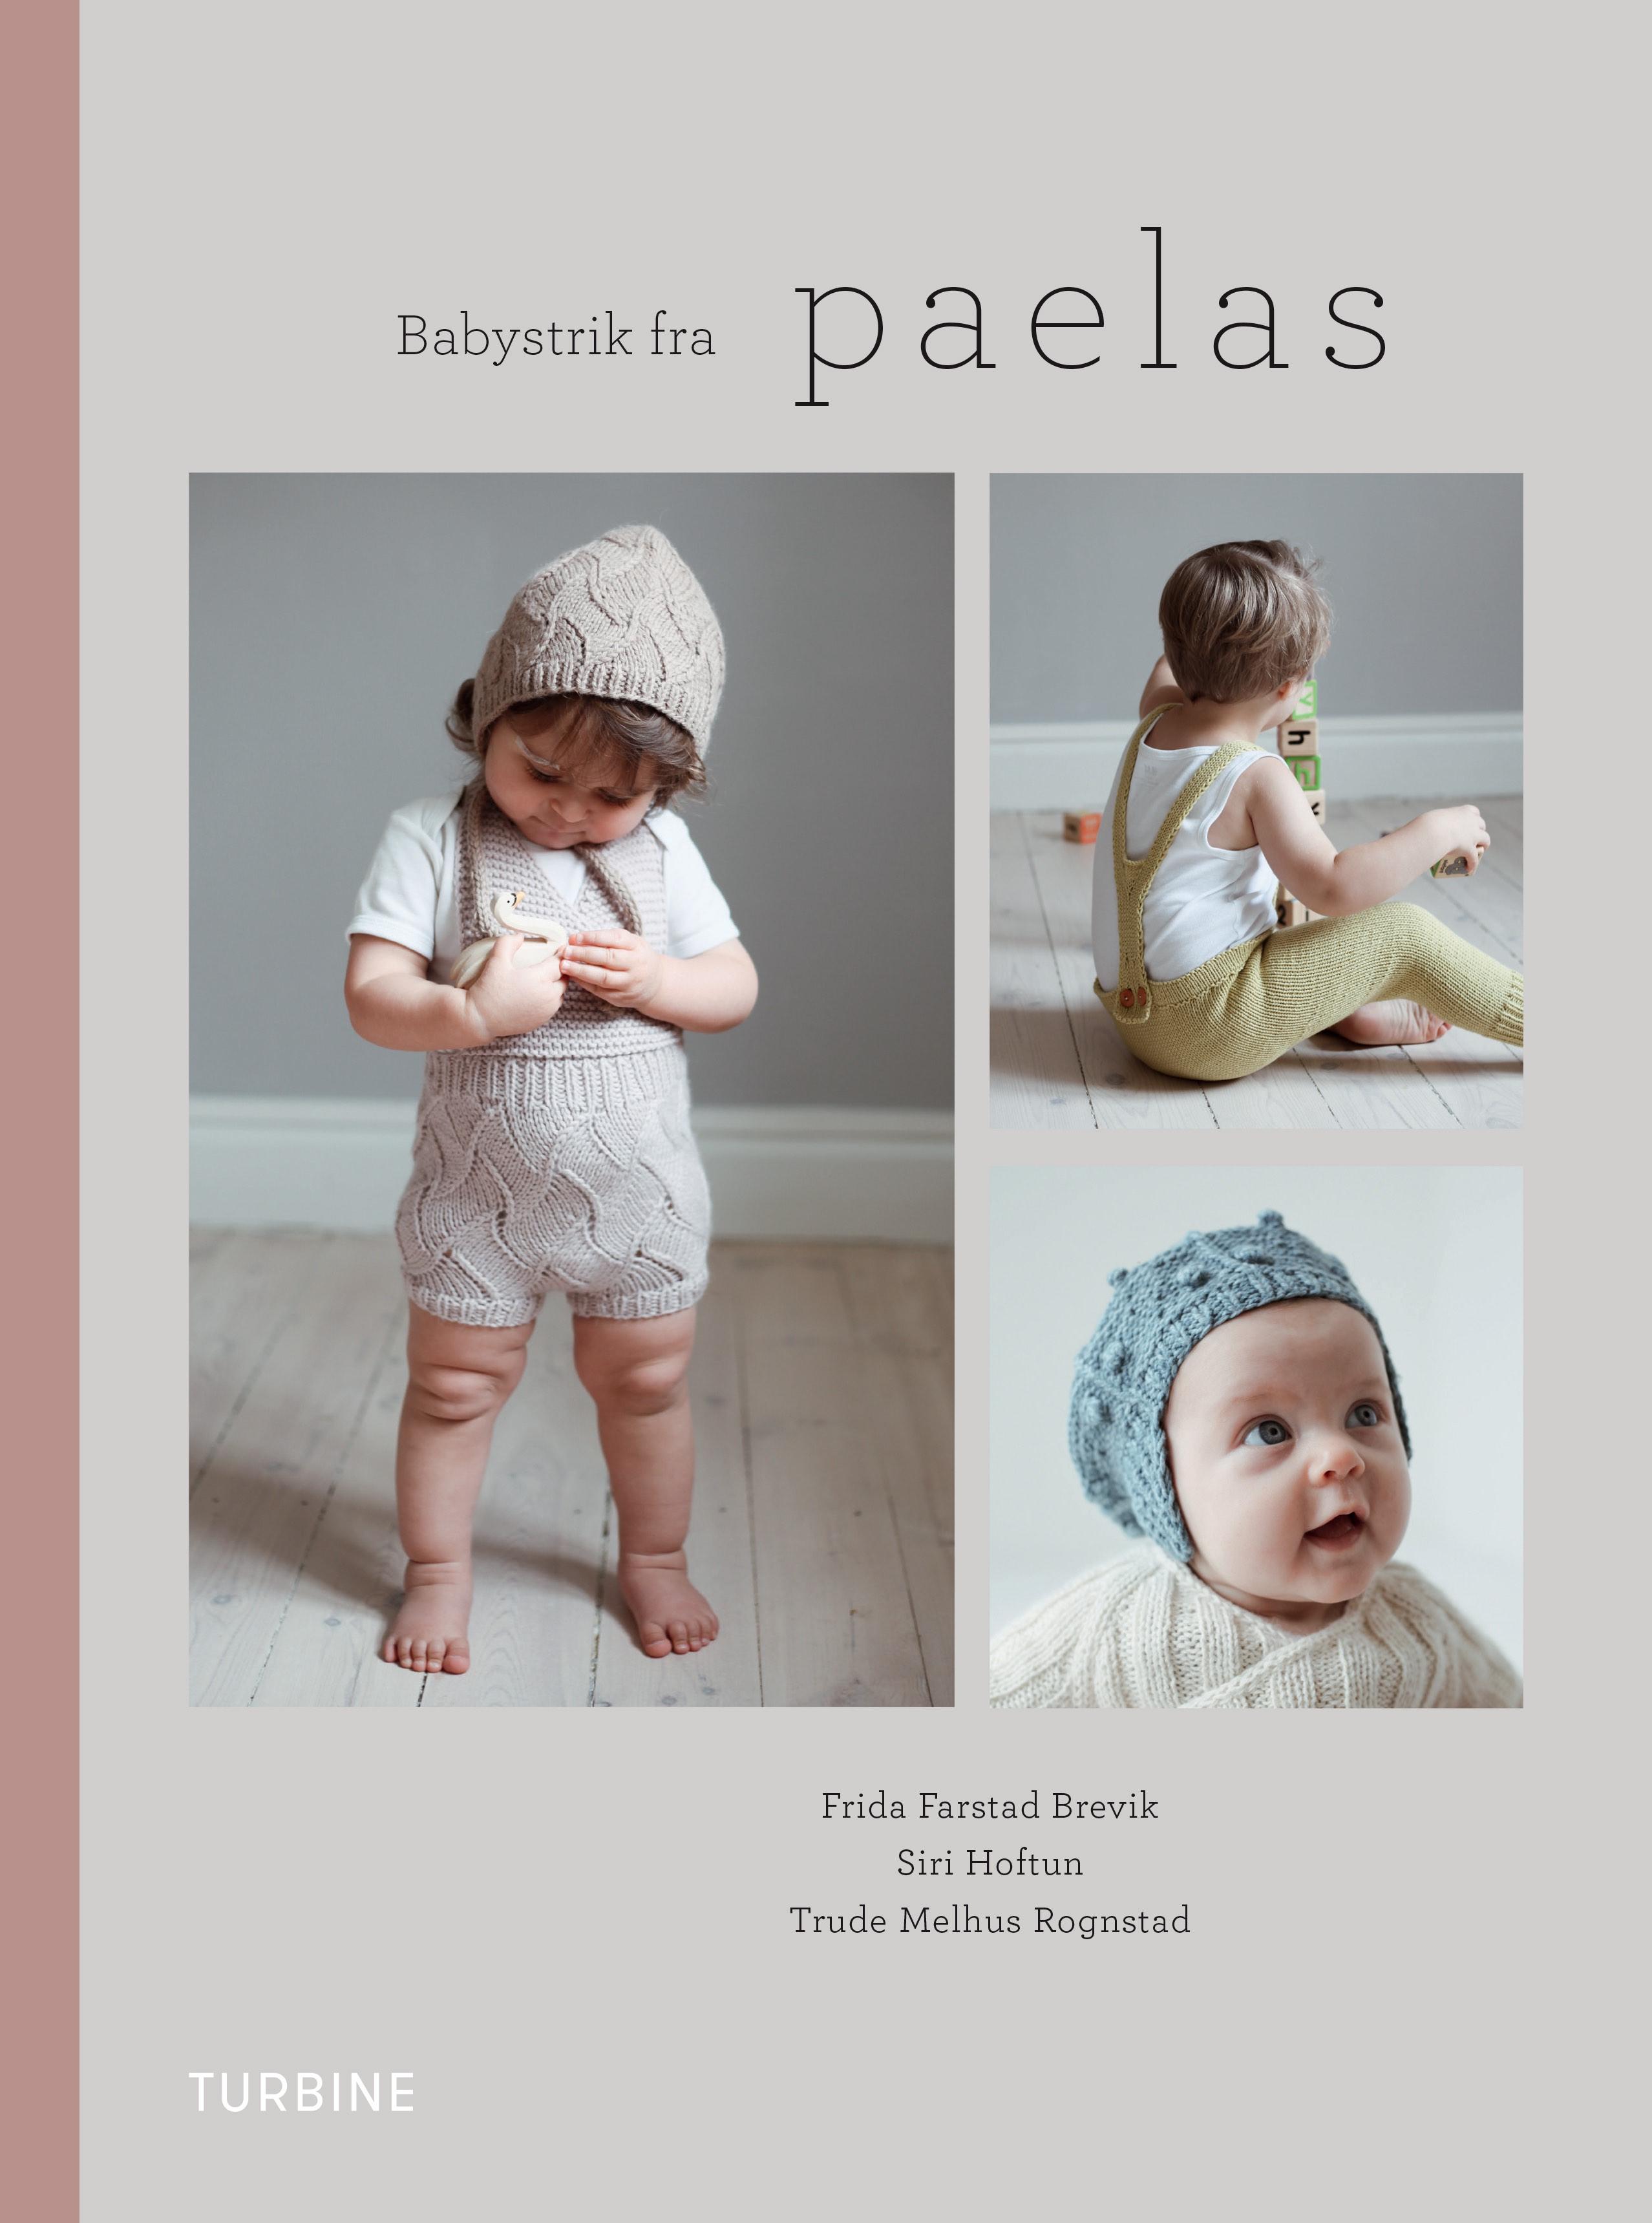 Babystrik fra paelas af Frida Farstad Brevik, Siri Hoftun & Trude Melhus Rognstad - 9788740658842